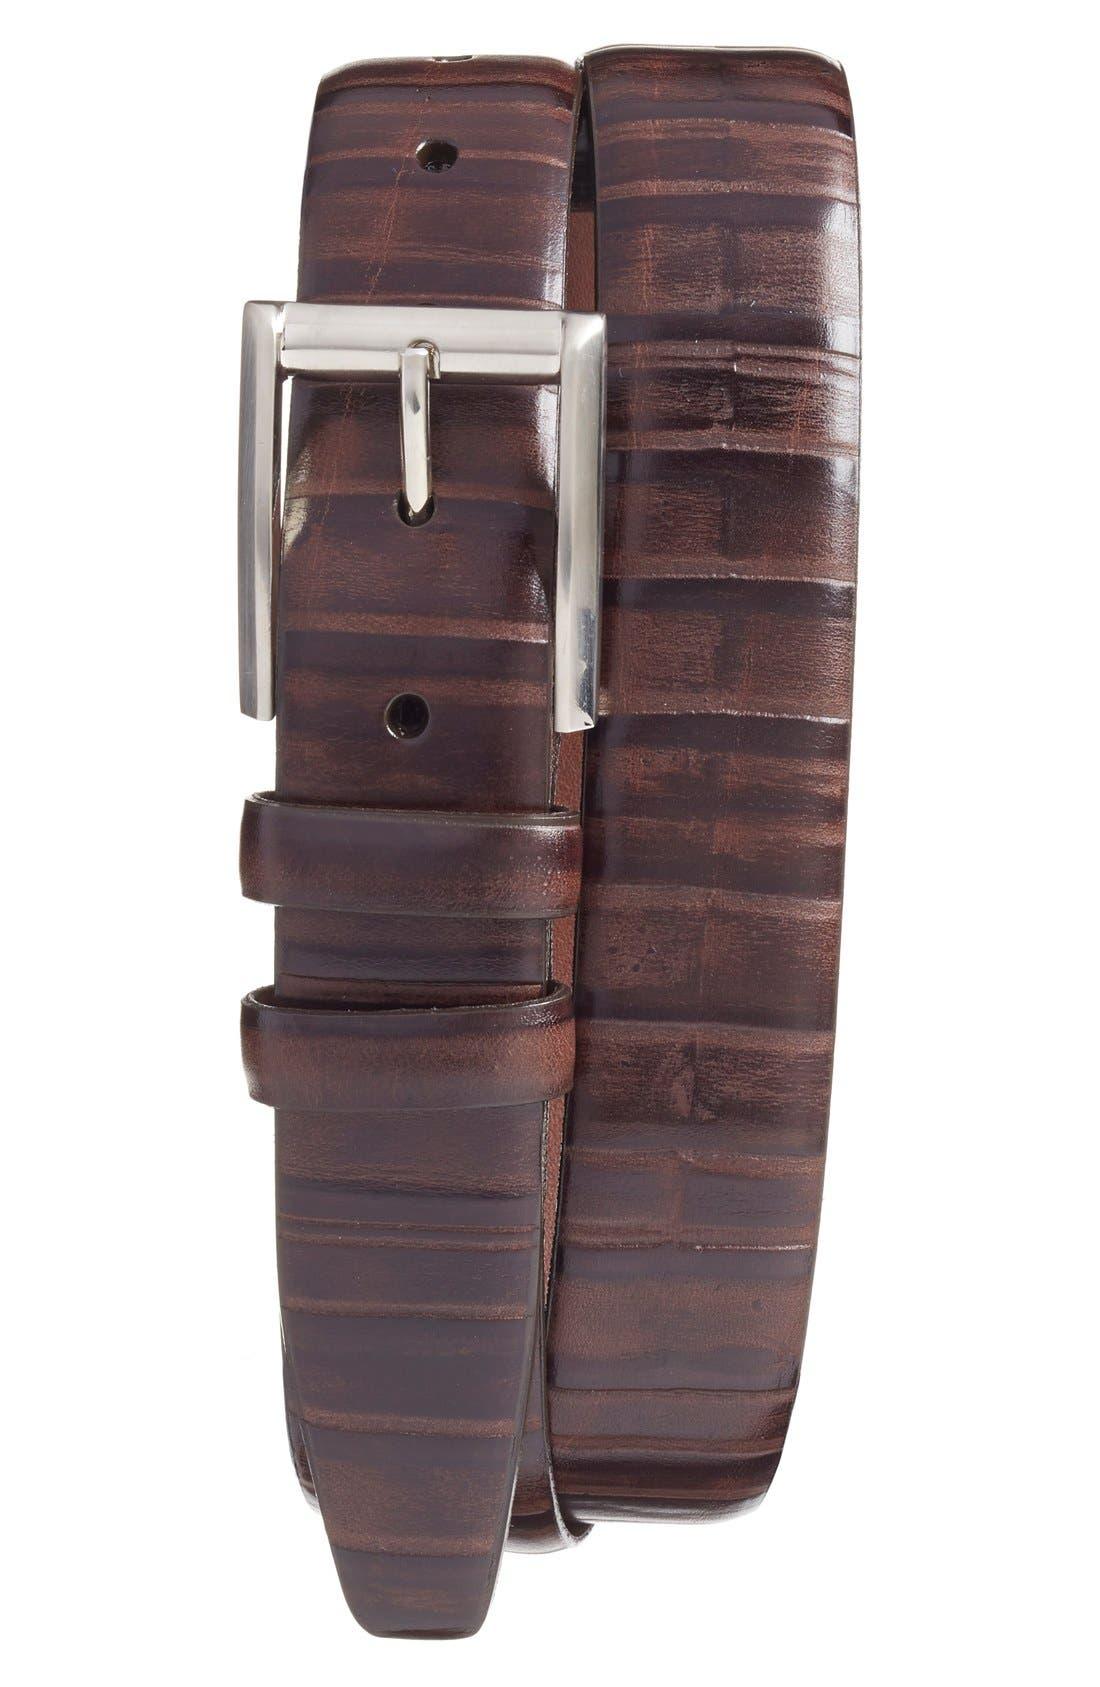 Alternate Image 1 Selected - Torino Belts Ribbed Kipskin Leather Belt